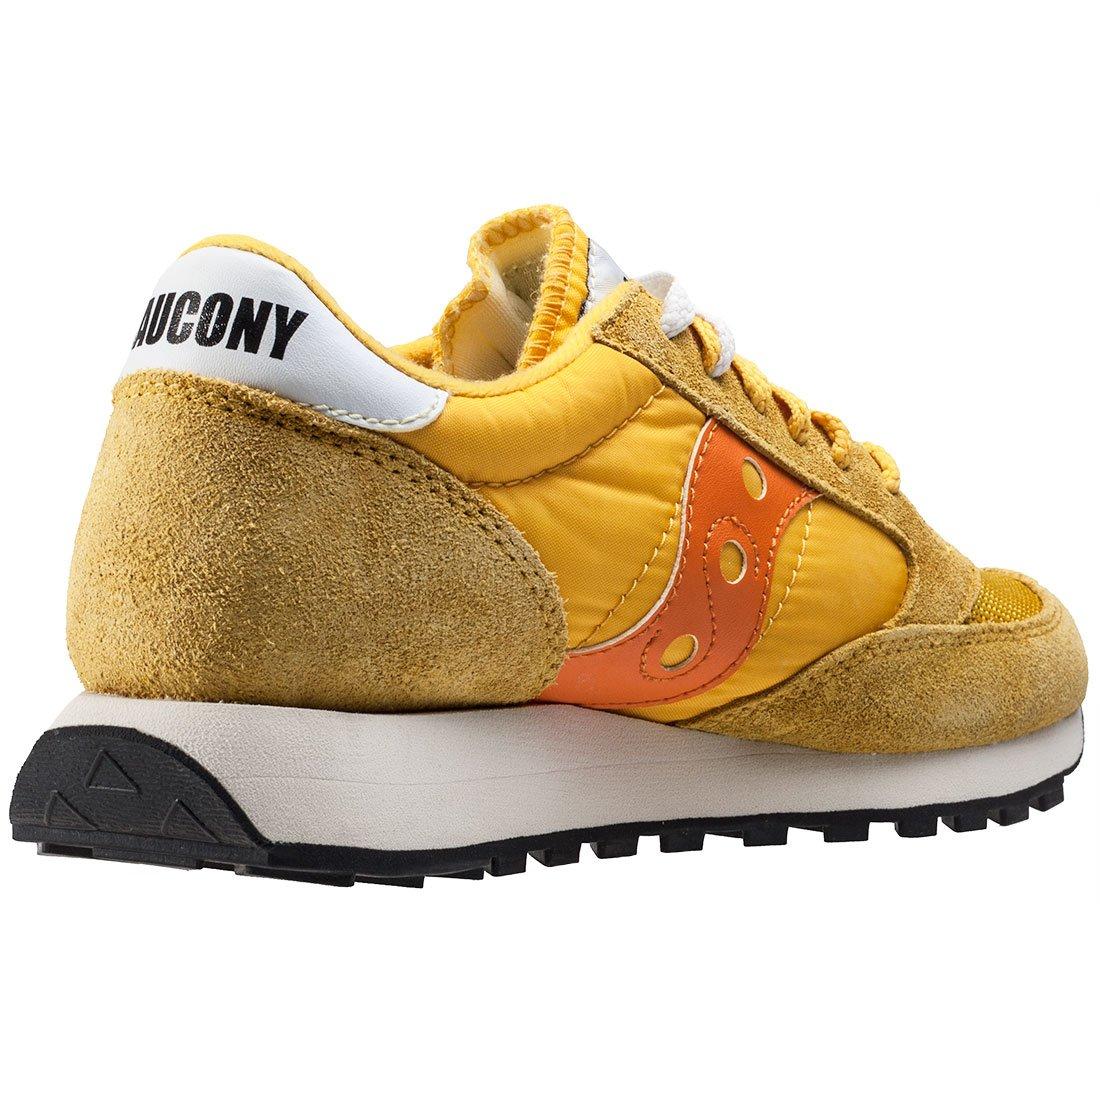 premium selection b318a 1274e Saucony Jazz Original Vintage Womens Trainers Yellow Orange - 6 UK   Amazon.co.uk  Shoes   Bags